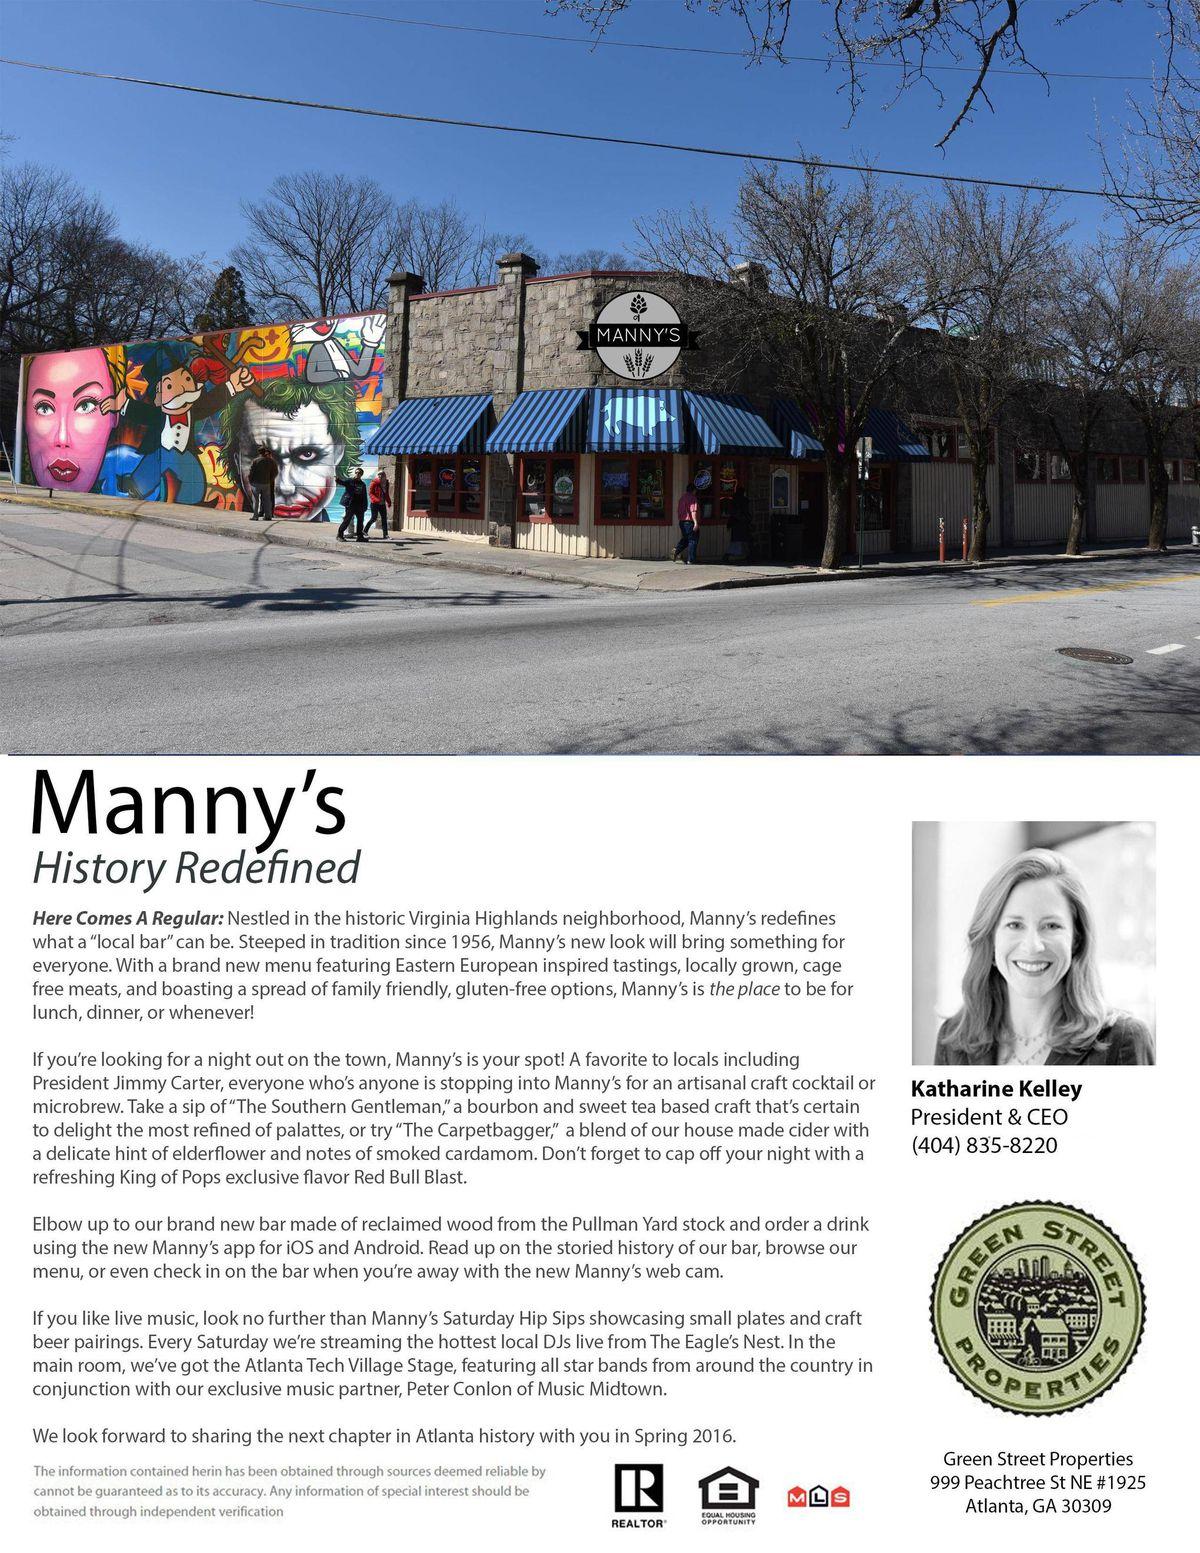 Manny's Tavern